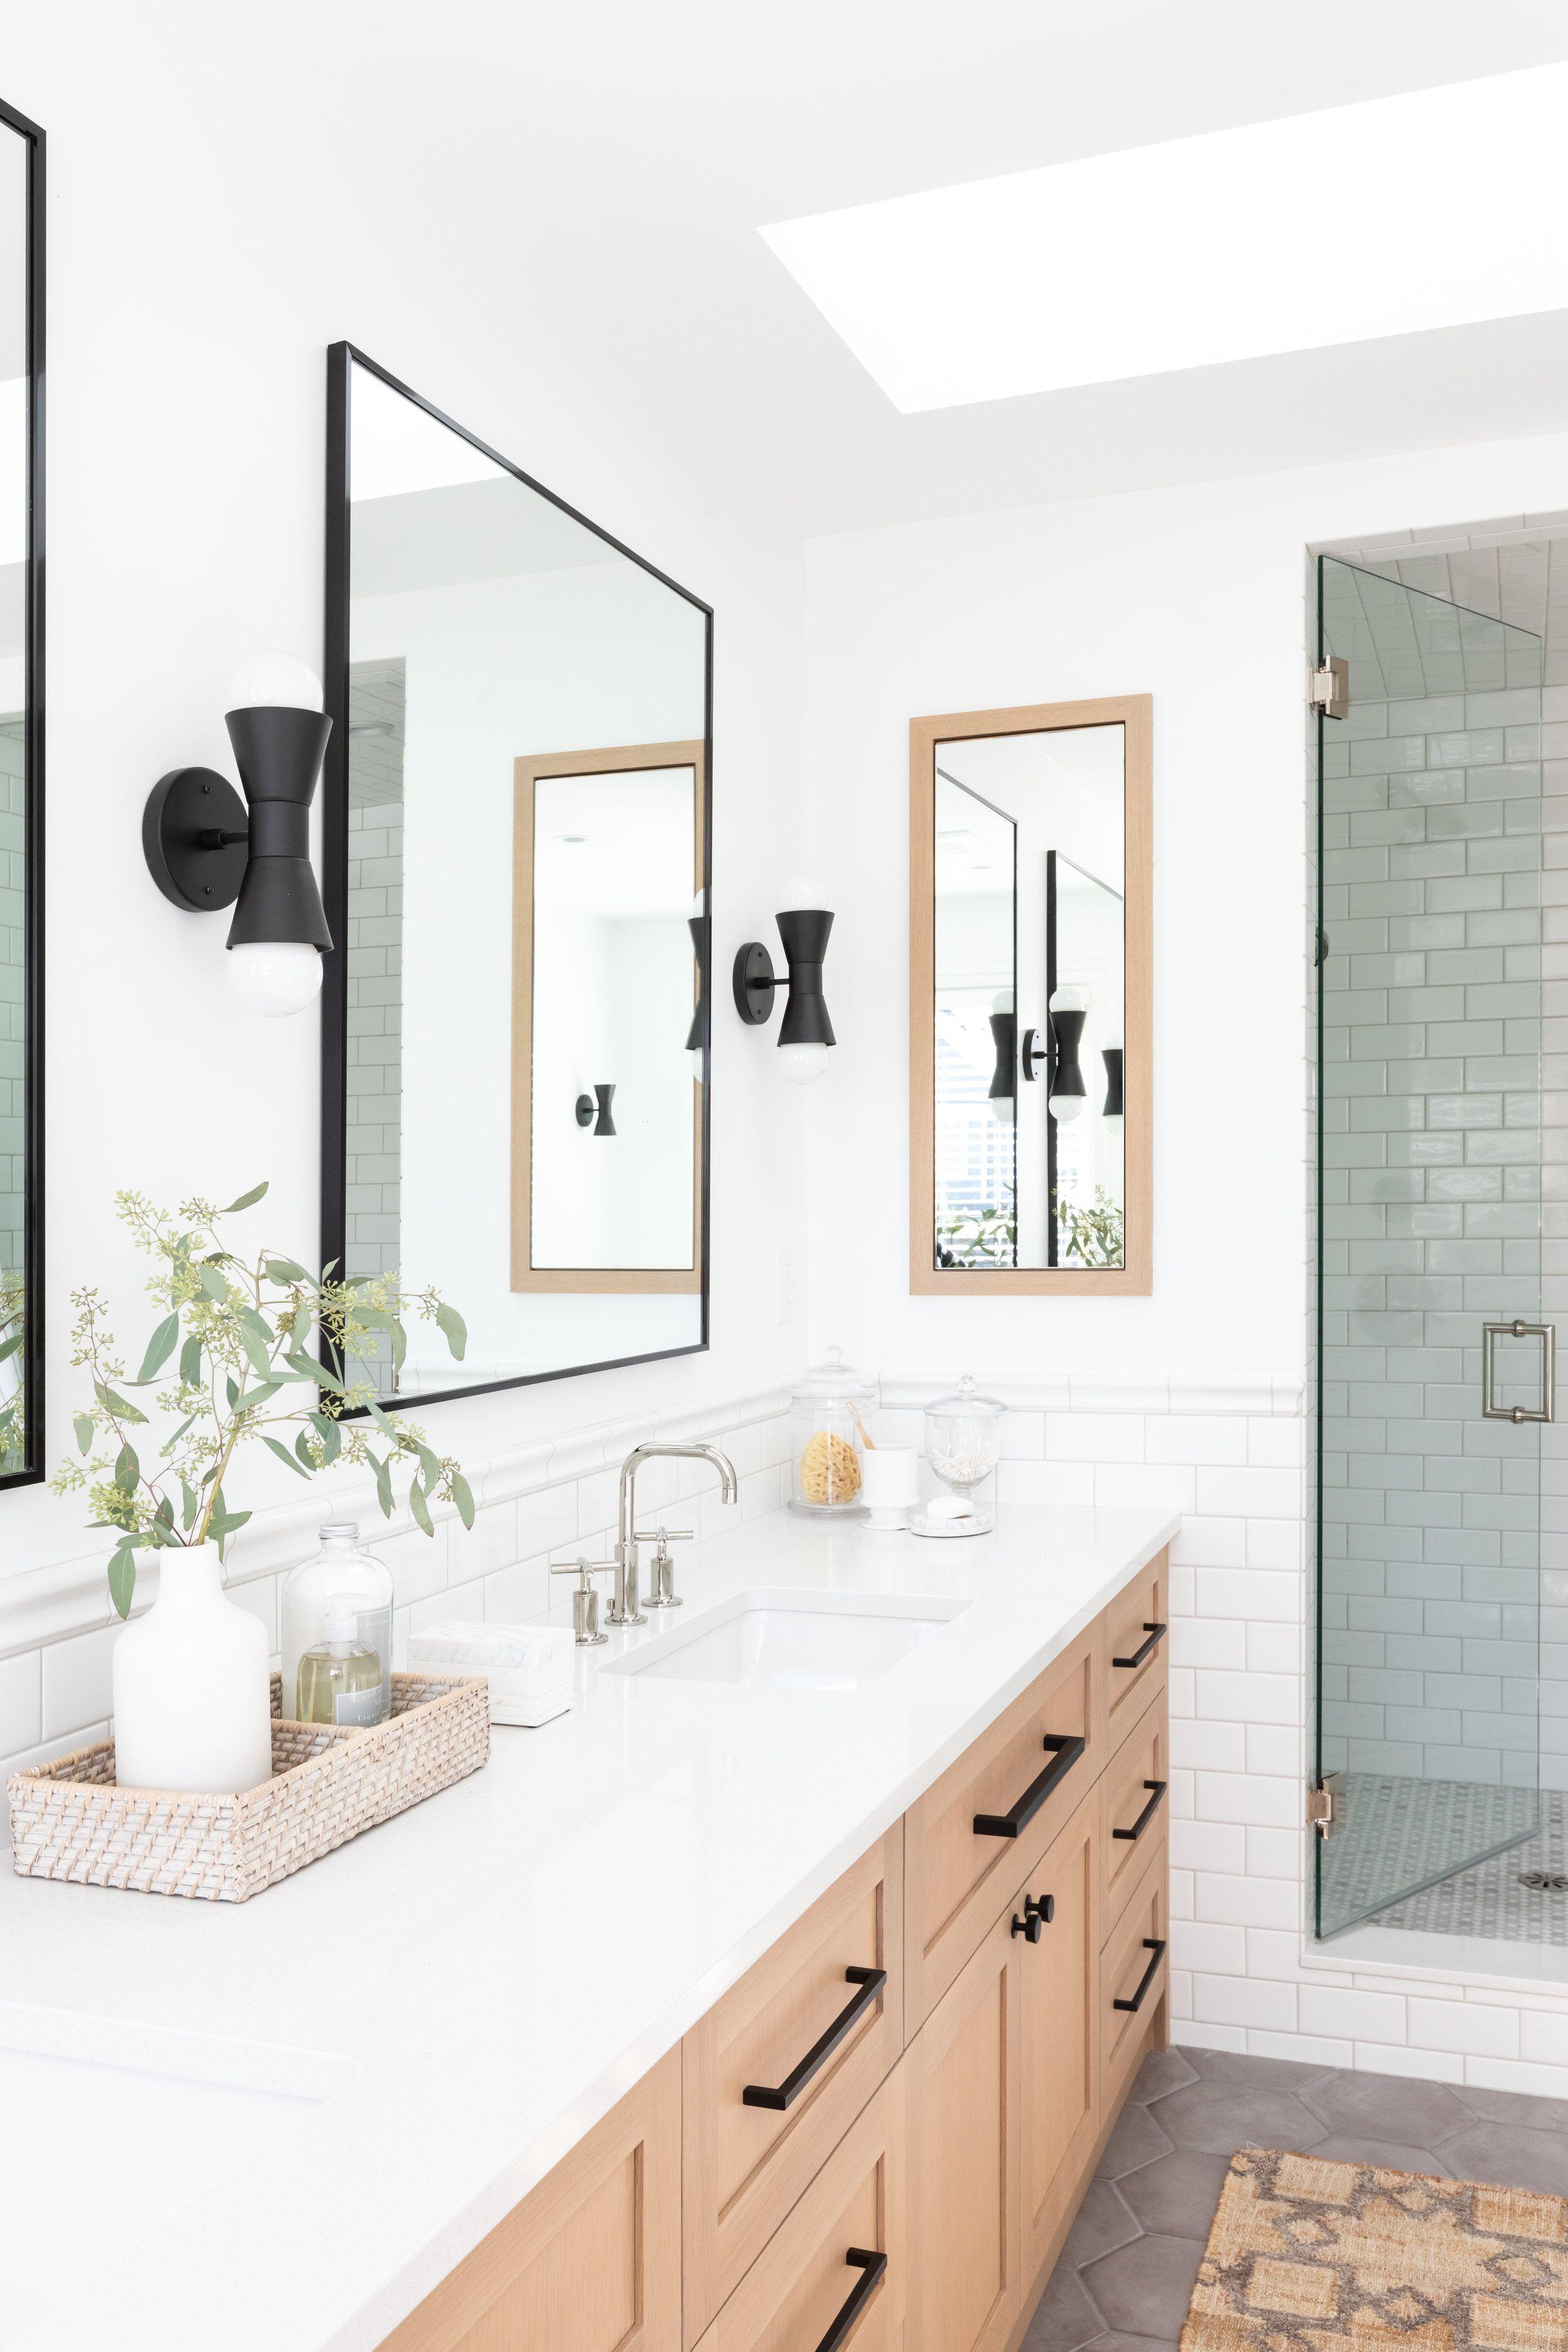 White Bathroom Bathroom With Brack Mirrors And Lighting Wood Vanity And White Countertops Black Har Bathroom Design Minimalist Bathroom Wood Bathroom Vanity